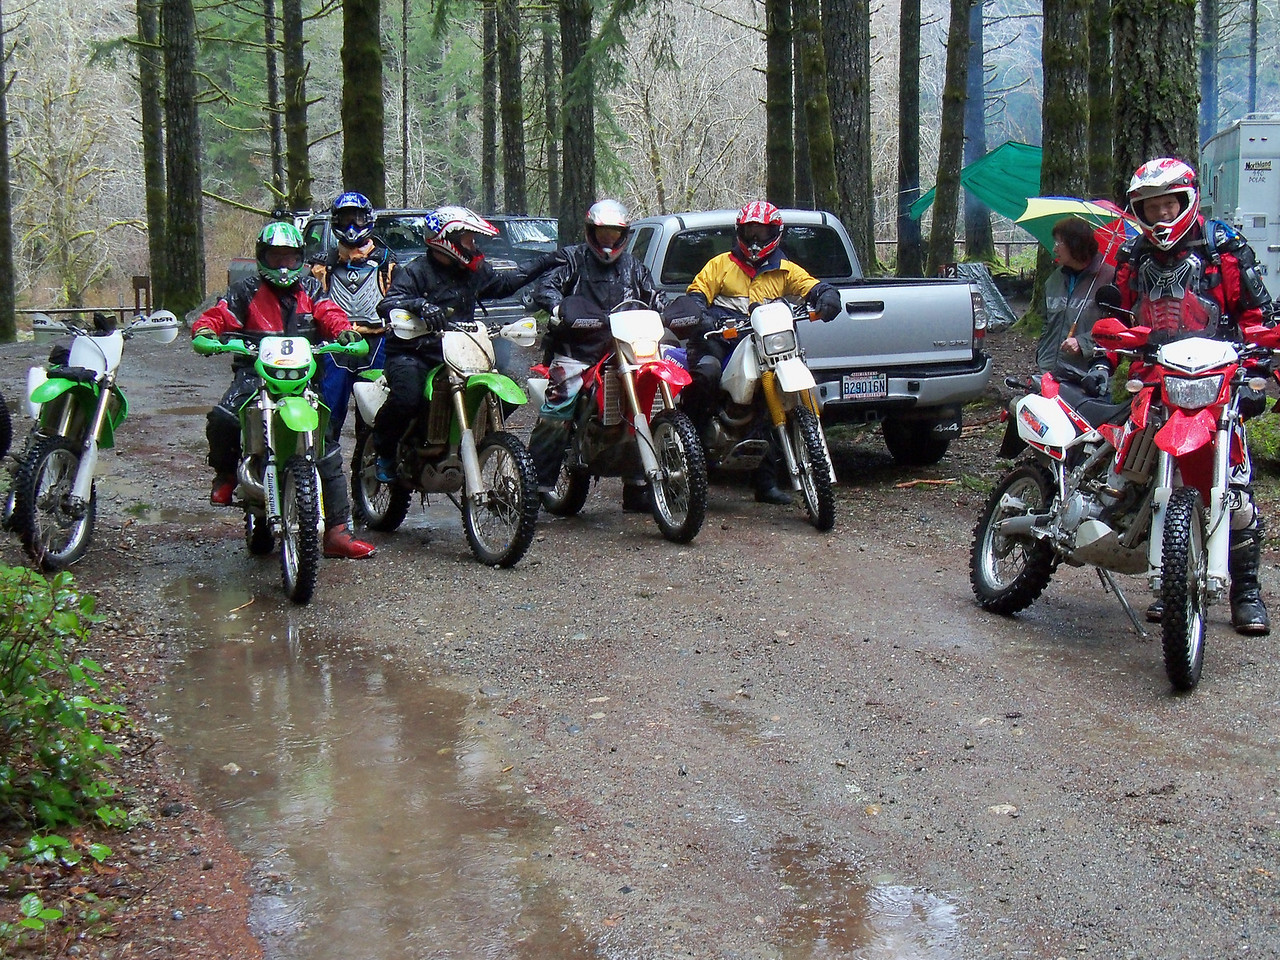 Saturday we started with 10 roders, Gary, Greg, Kurt, Bill, Danny, Steve, Lan, Kris, Bart, Rob...